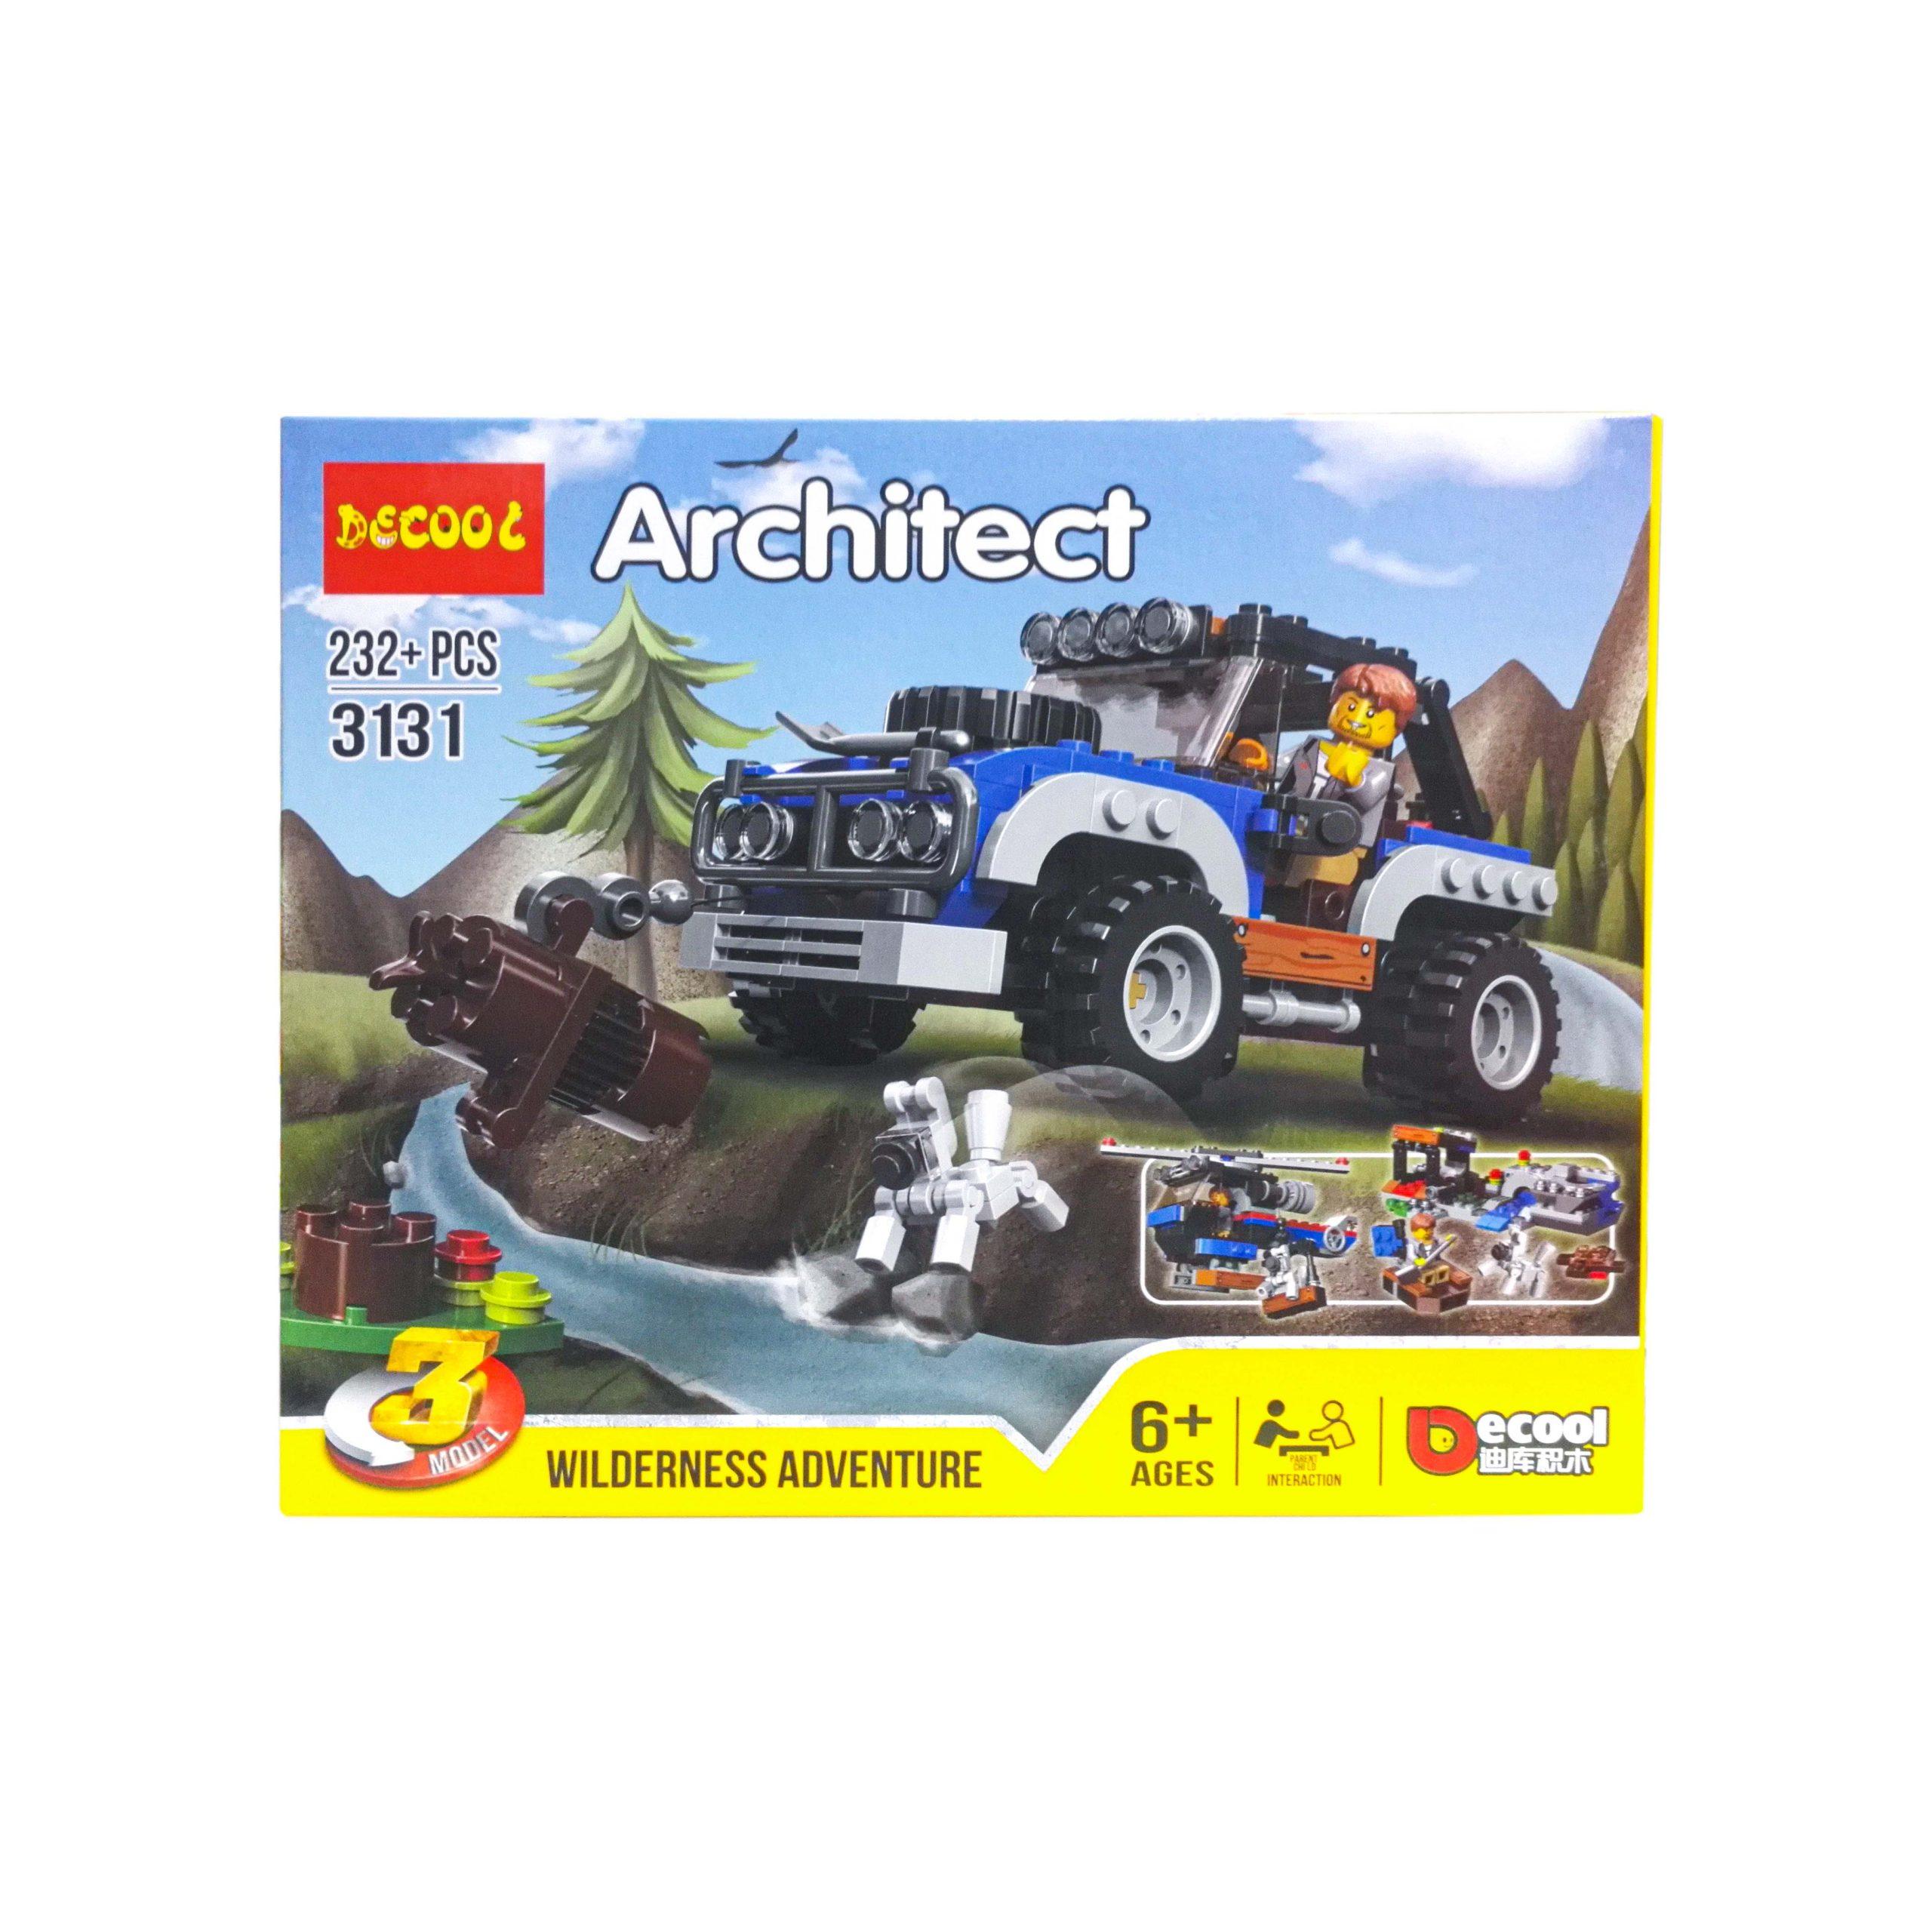 آرشیتکت کد 3131 دکول 1 2560x2560 - Home Toys